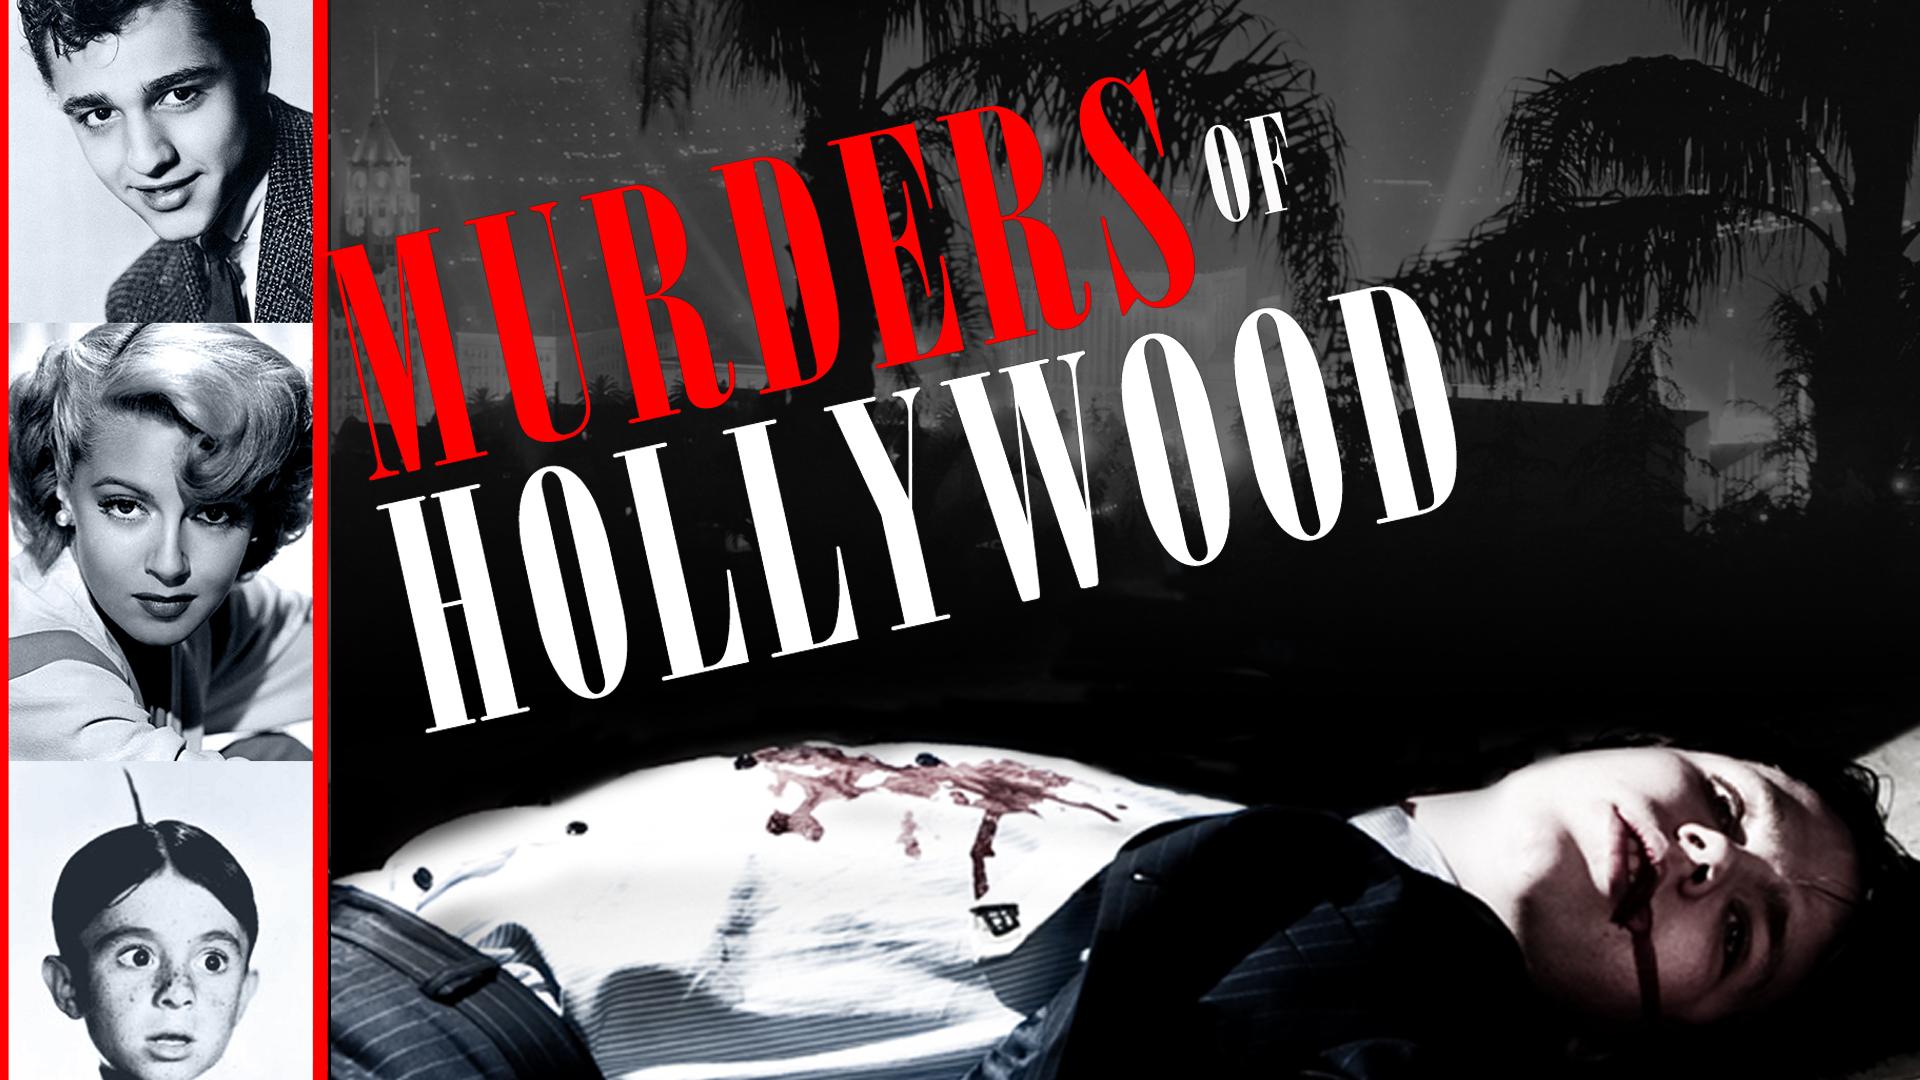 Murders of Hollywood